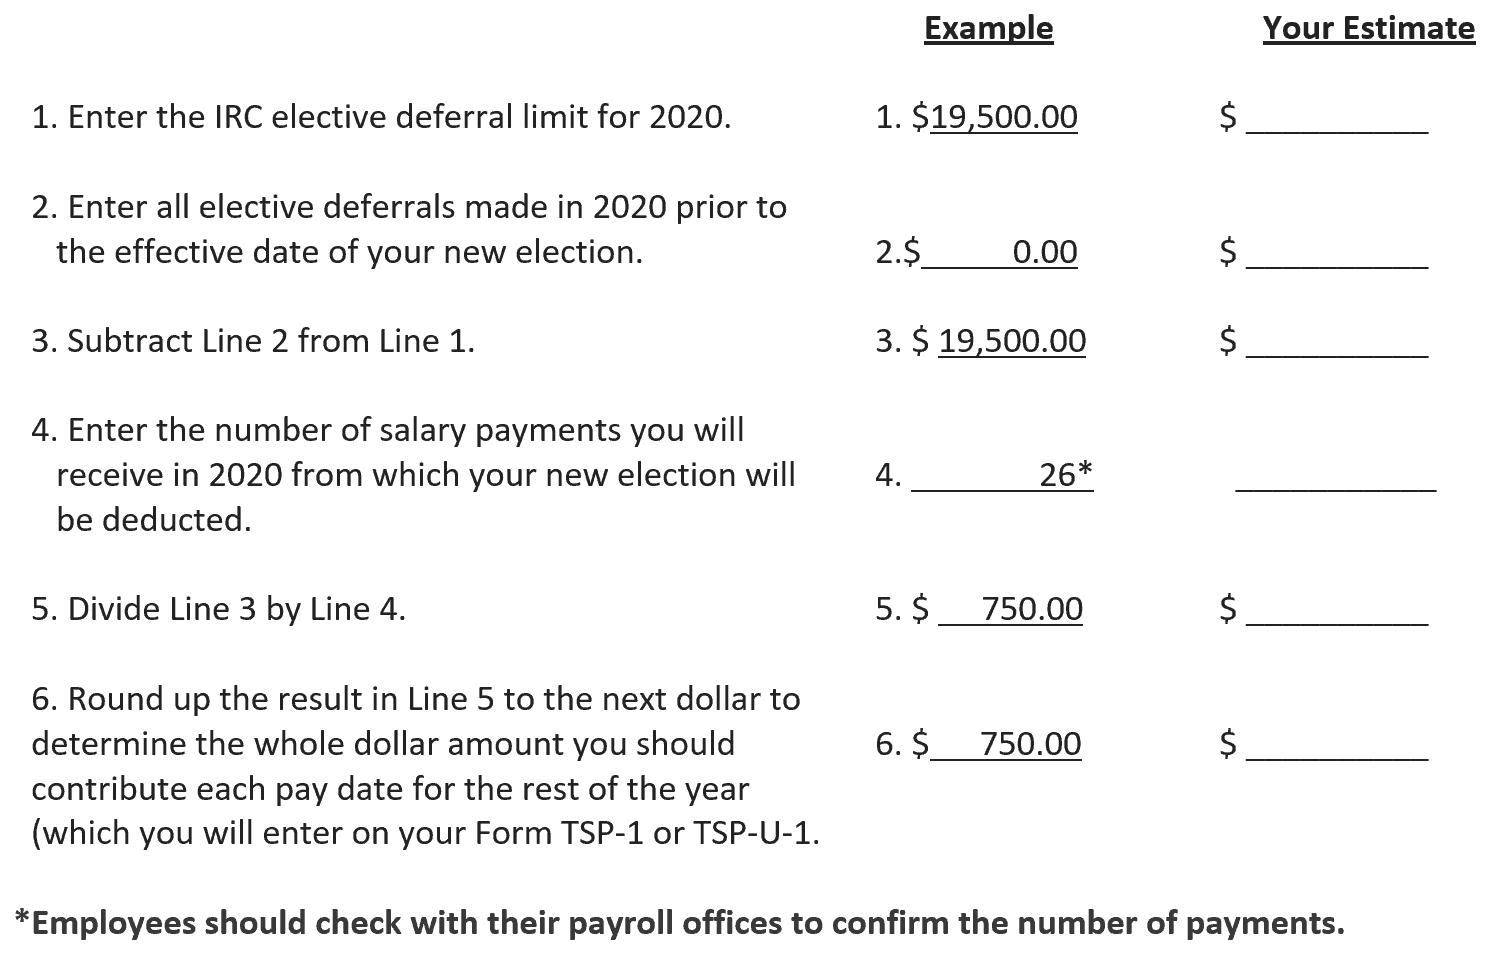 max tsp contribution 2020